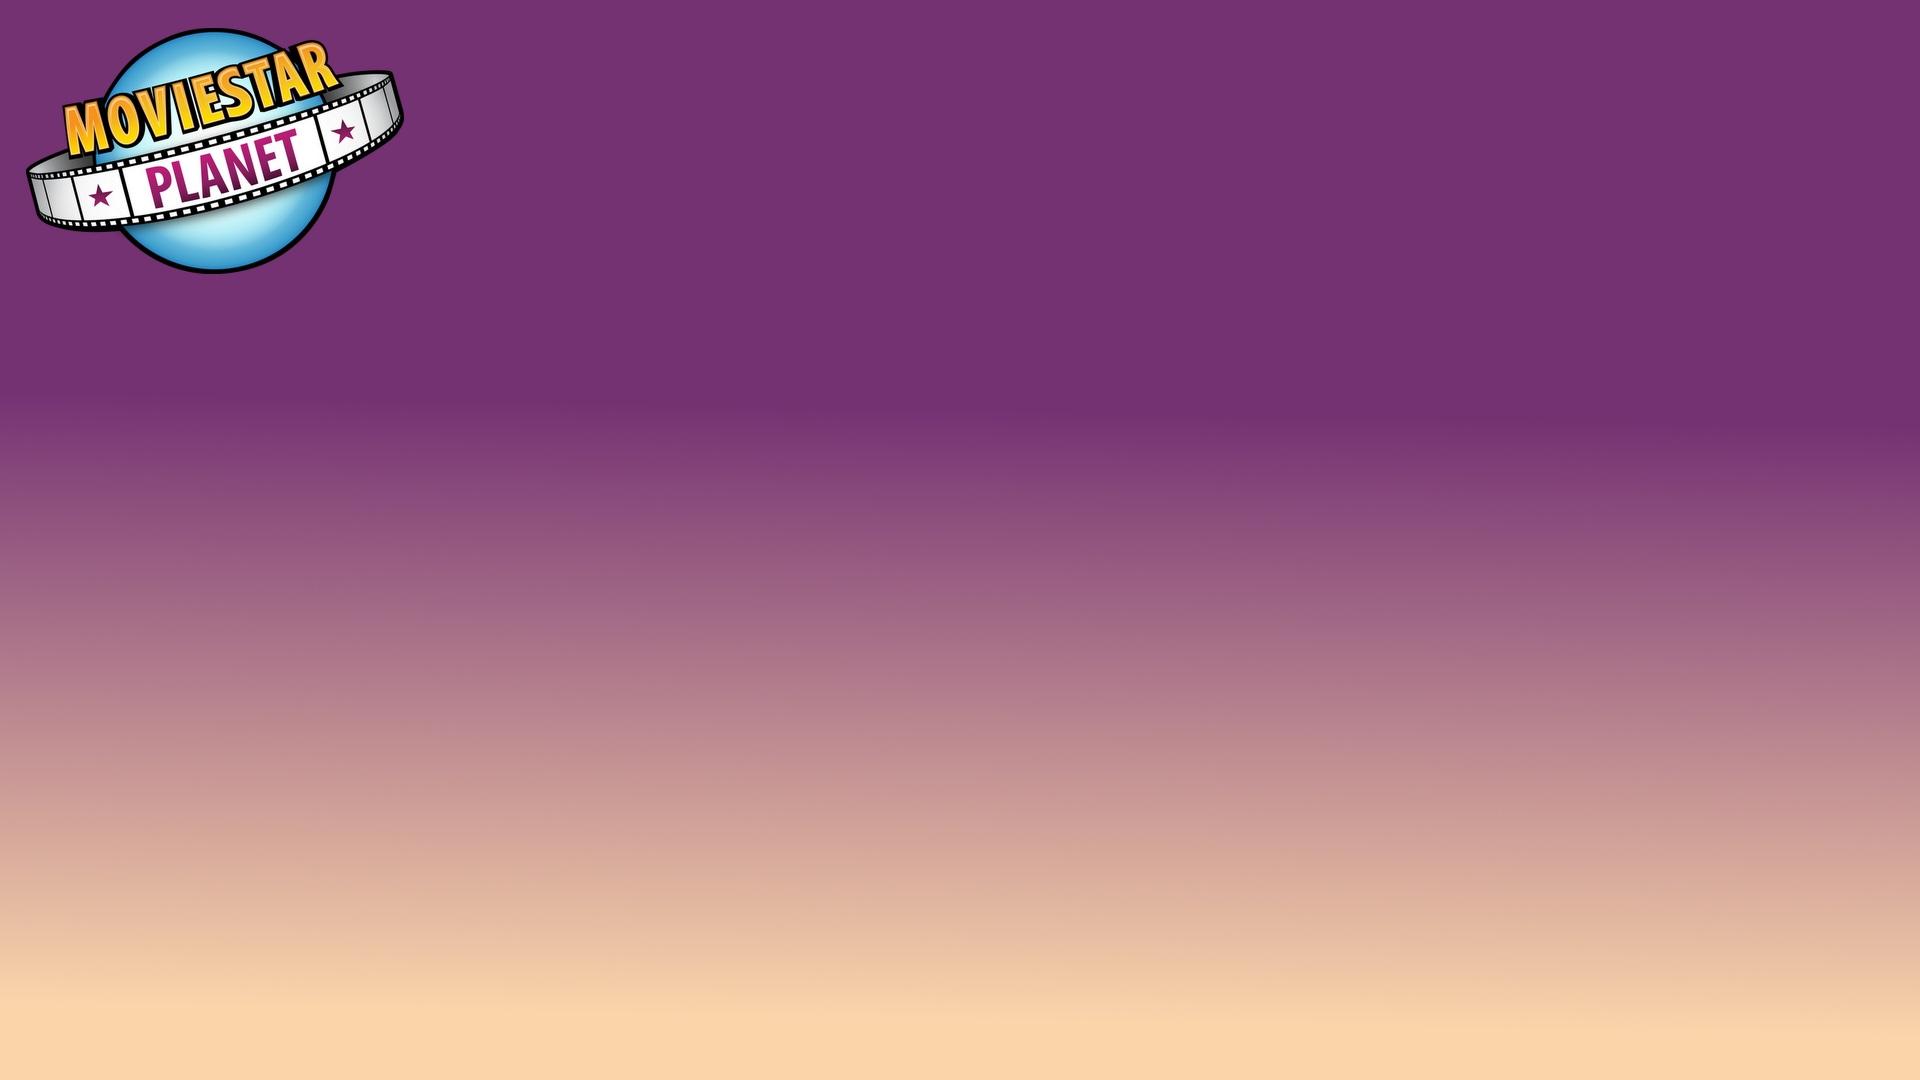 Free Download Best 65 Msp Wallpapers On Hipwallpaper Msp Wallpapers Msp 1920x1080 For Your Desktop Mobile Tablet Explore 44 Moviestarplanet Backgrounds Moviestarplanet Wallpaper